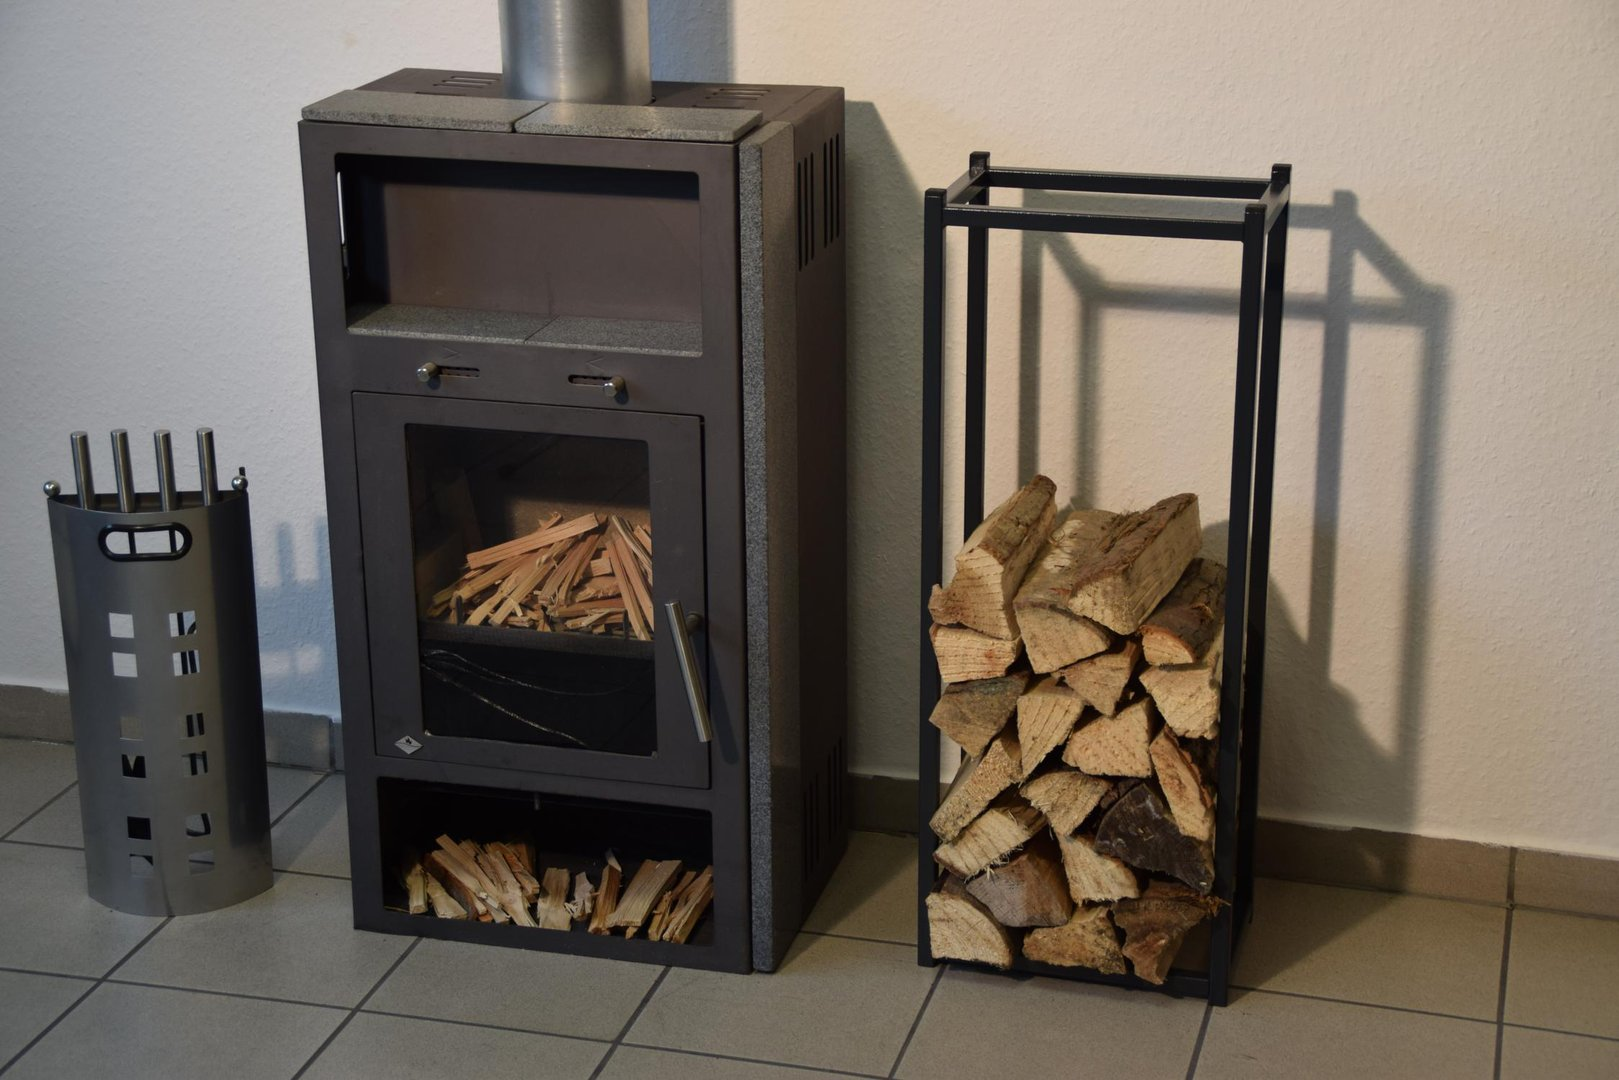 kaminholzregal innen stab 900x350 aus metall. Black Bedroom Furniture Sets. Home Design Ideas